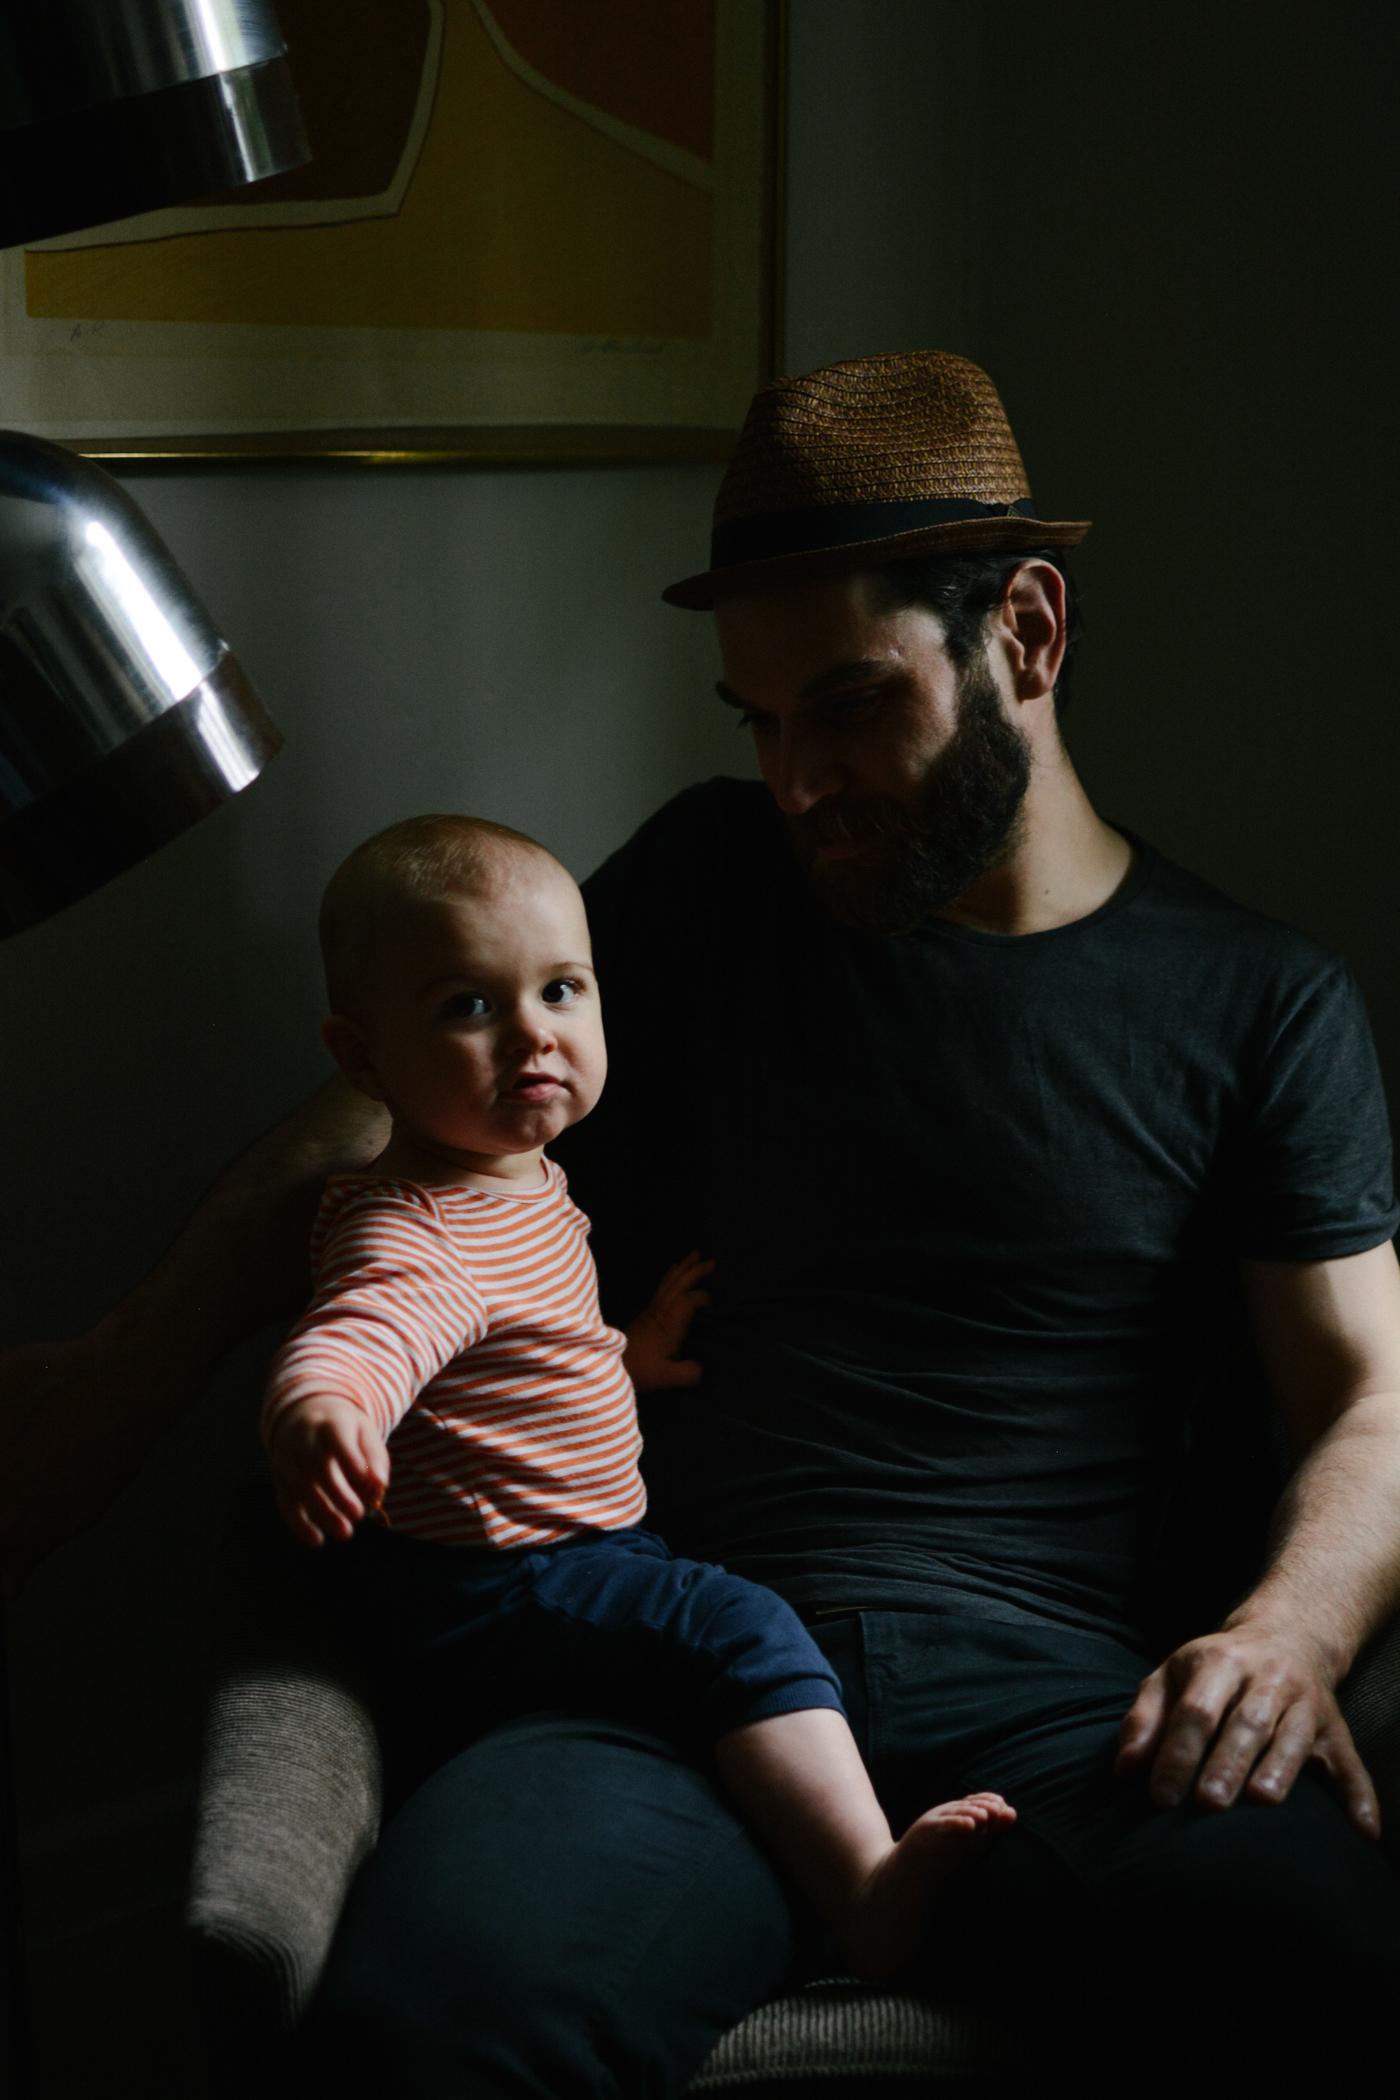 Bebe_toute_annee_Marianne_Charland_photographe_famille_nouveau-ne_enfant_Montreal_Basse-35.jpg